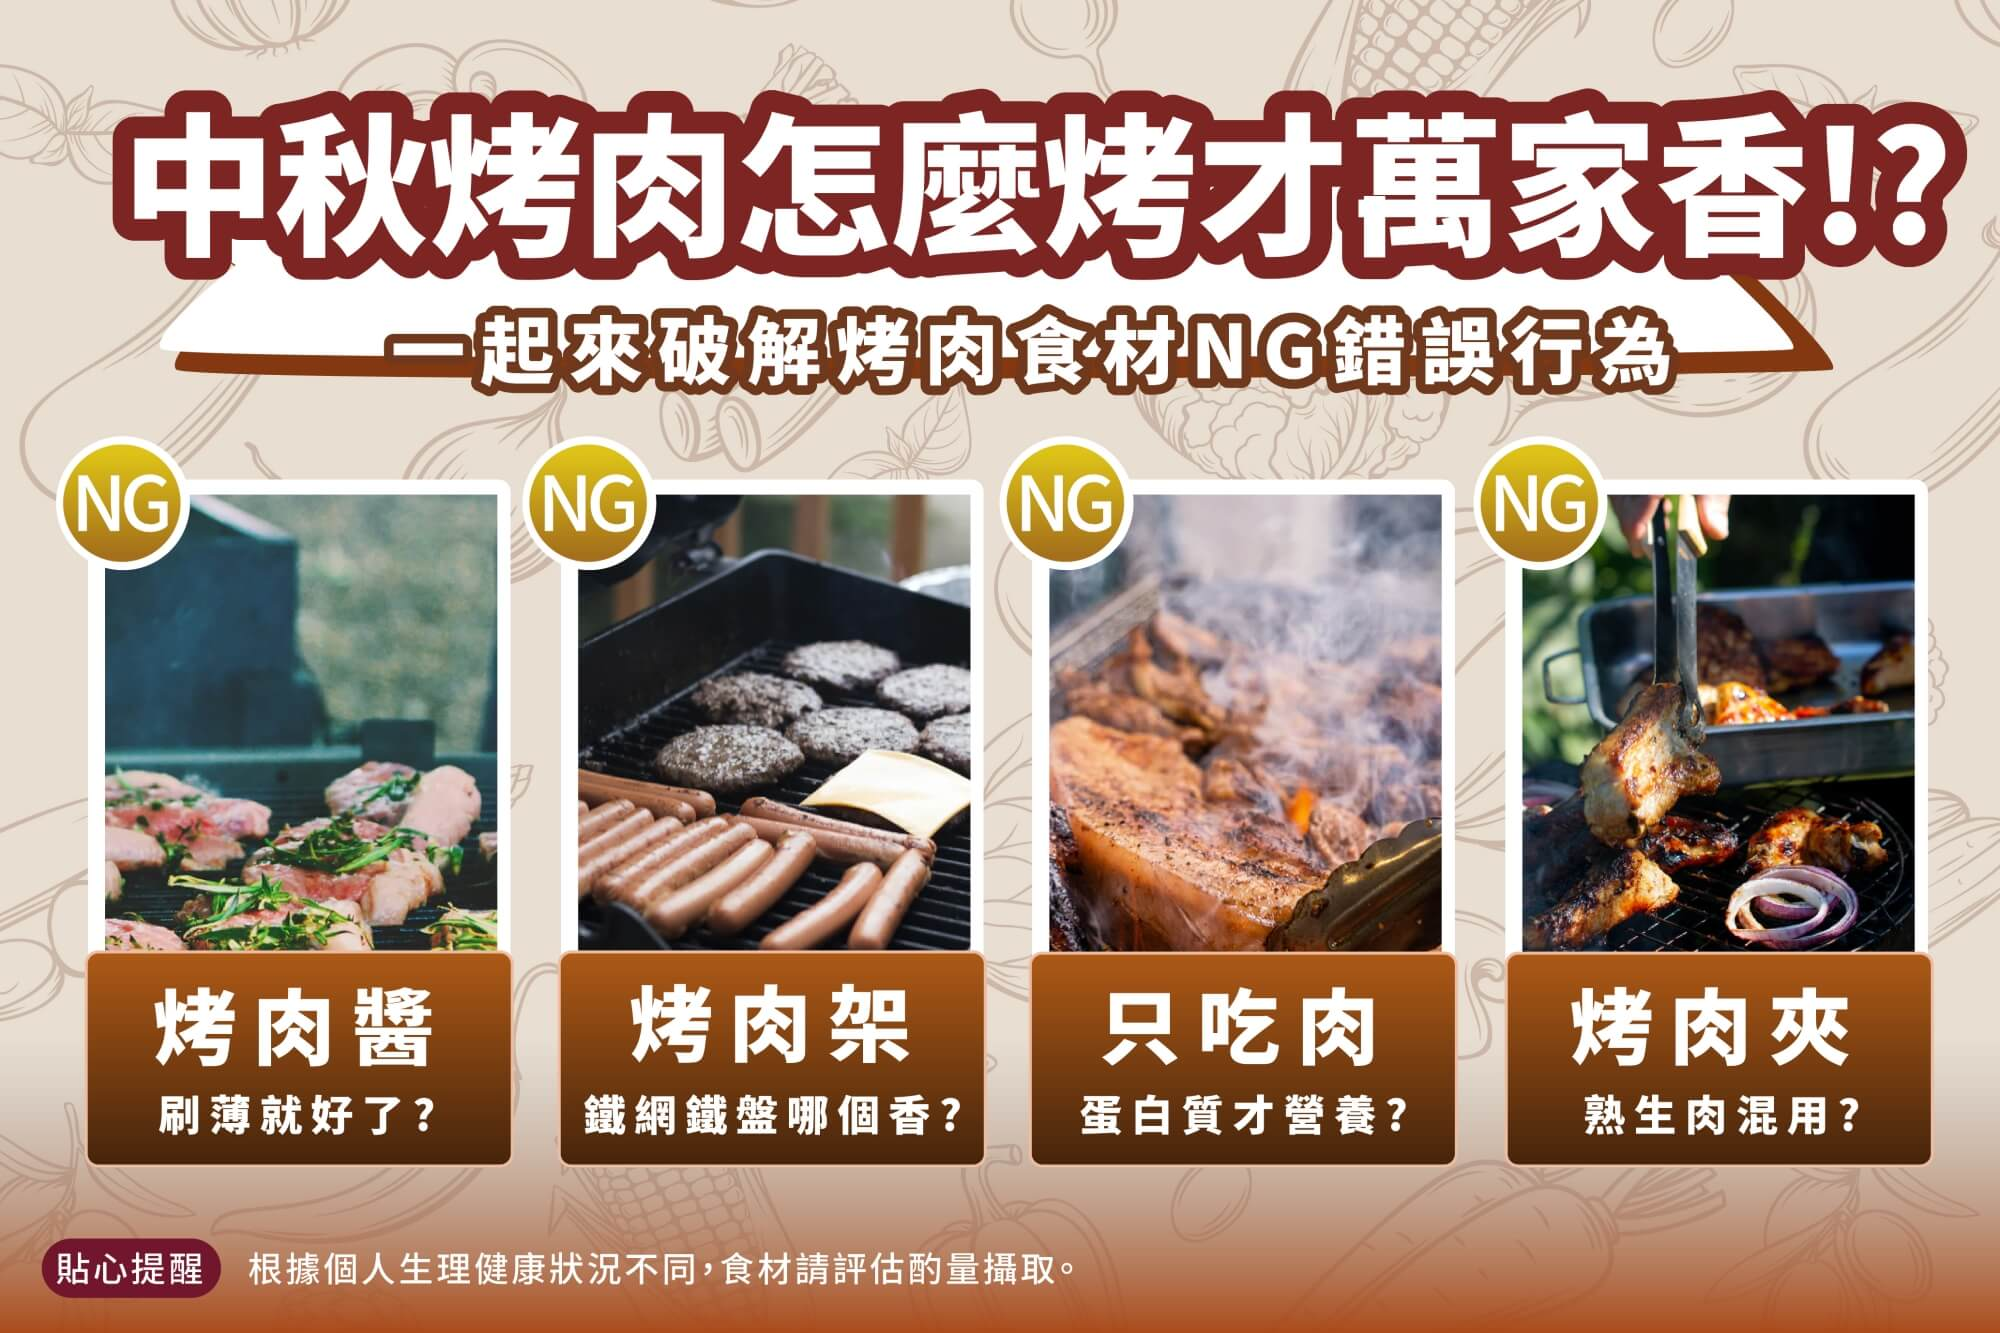 Read more about the article 中秋烤肉 NG迷思詳細解析!少醬料、電烤盤取代炭火,生熟食器具確實分開